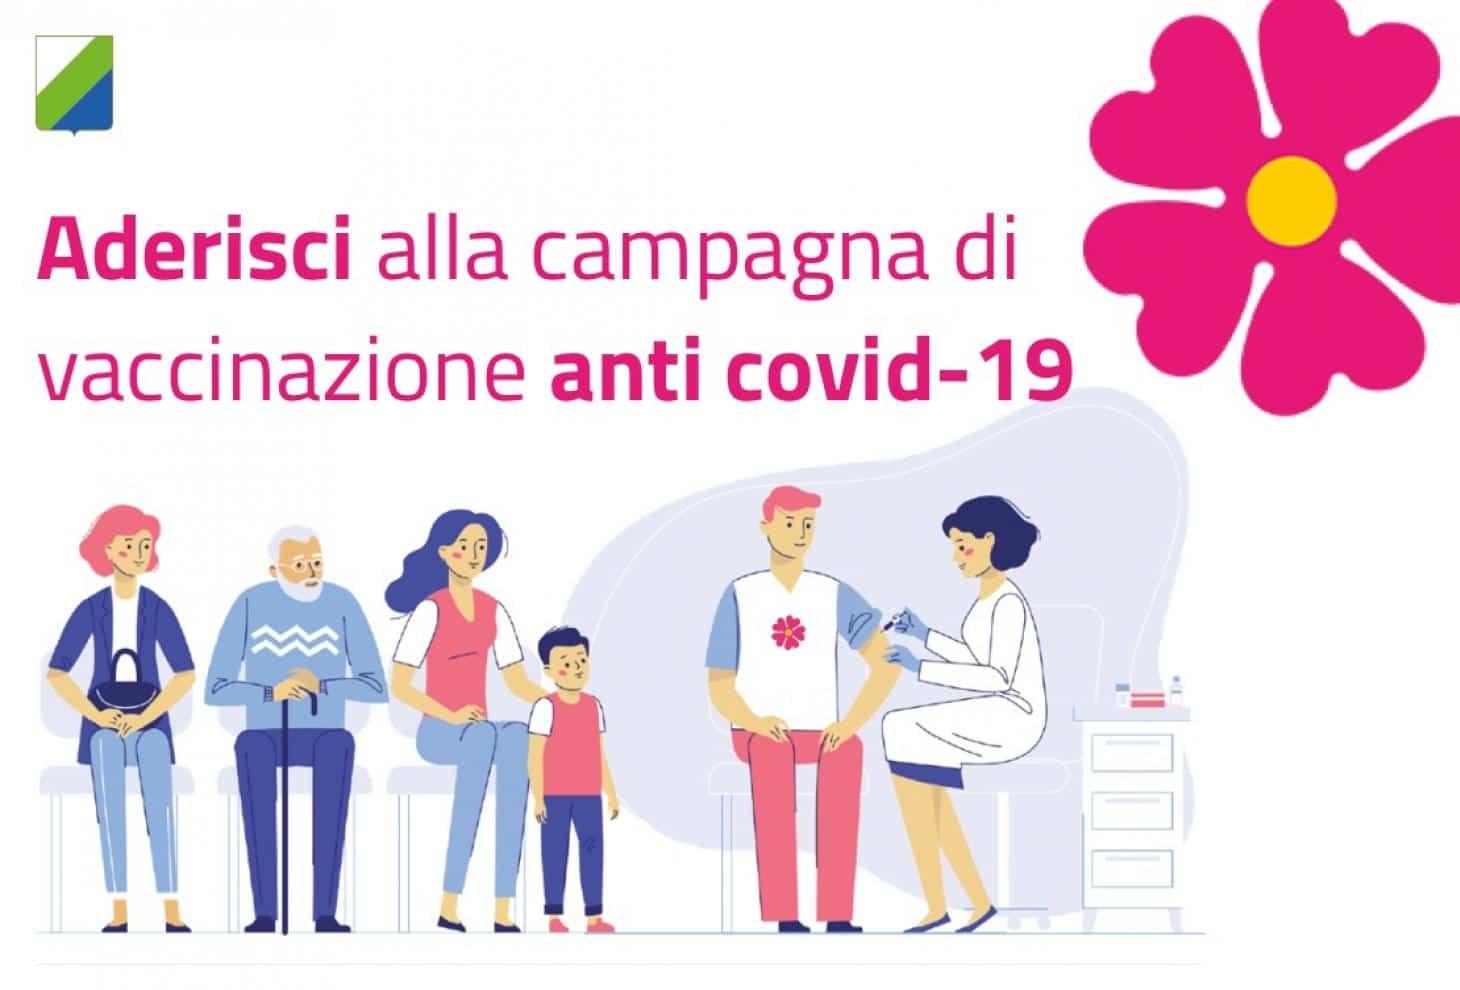 Vaccinazione anti Covid-19, alle 9 di stamattina raccolte 10701 manifestazioni di interesse